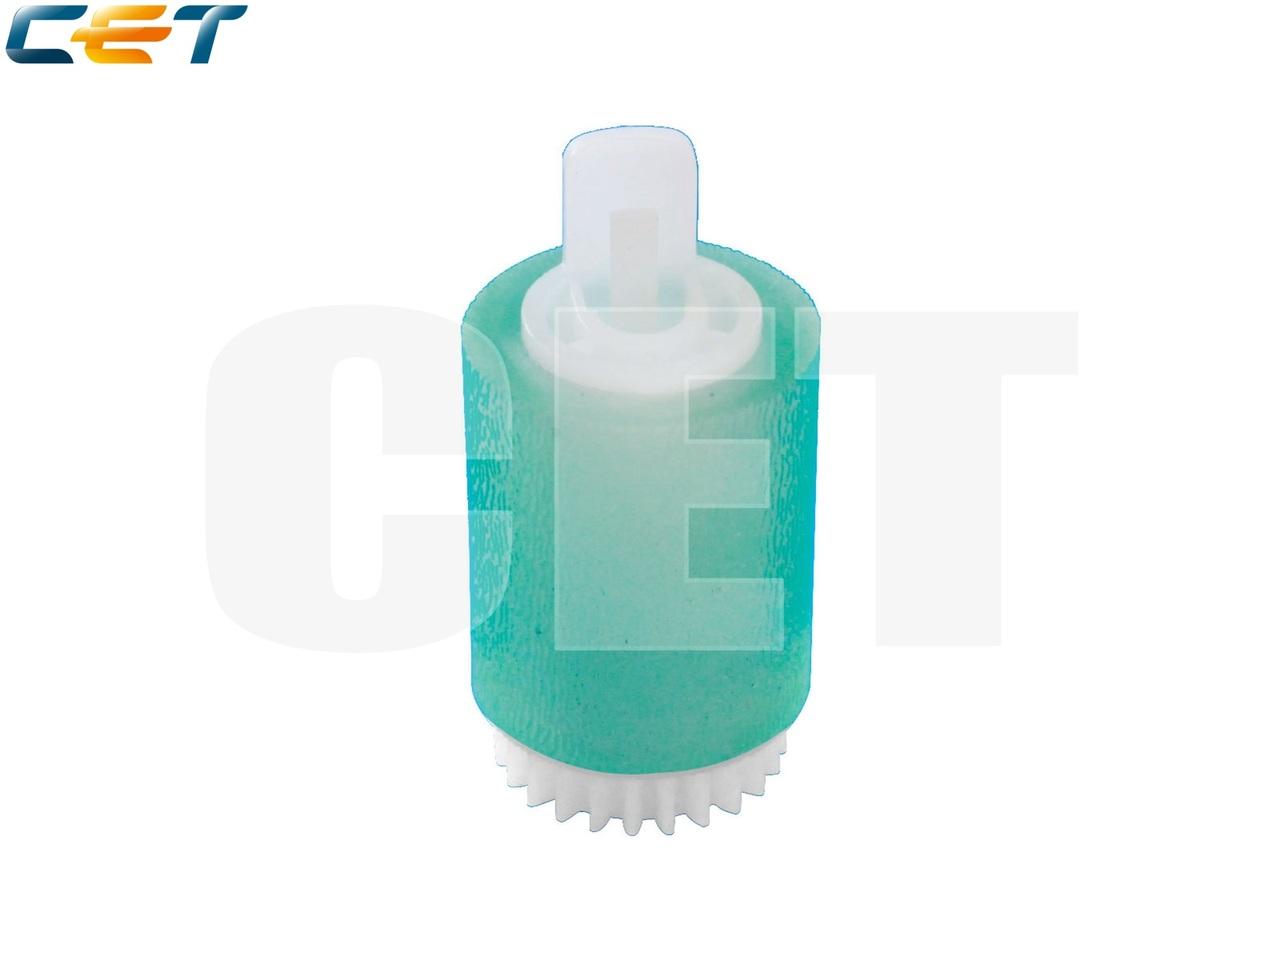 Ролик подачи FC6-7083-000 для CANON iR ADVANCE4025/4035/4045/4051/4225/4235/4245/4251 (CET), CET6559